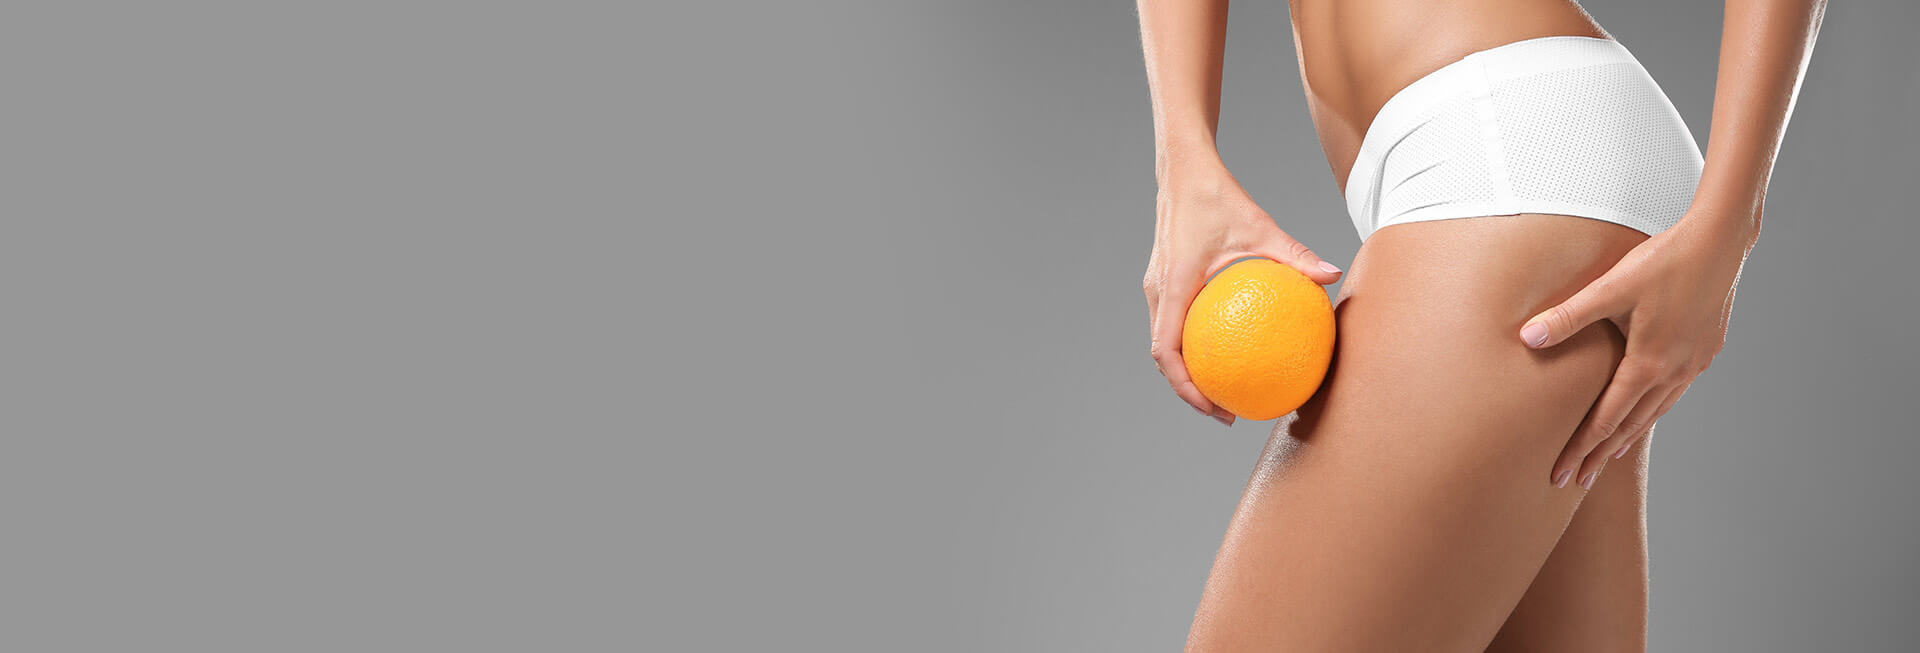 STOP cellulit